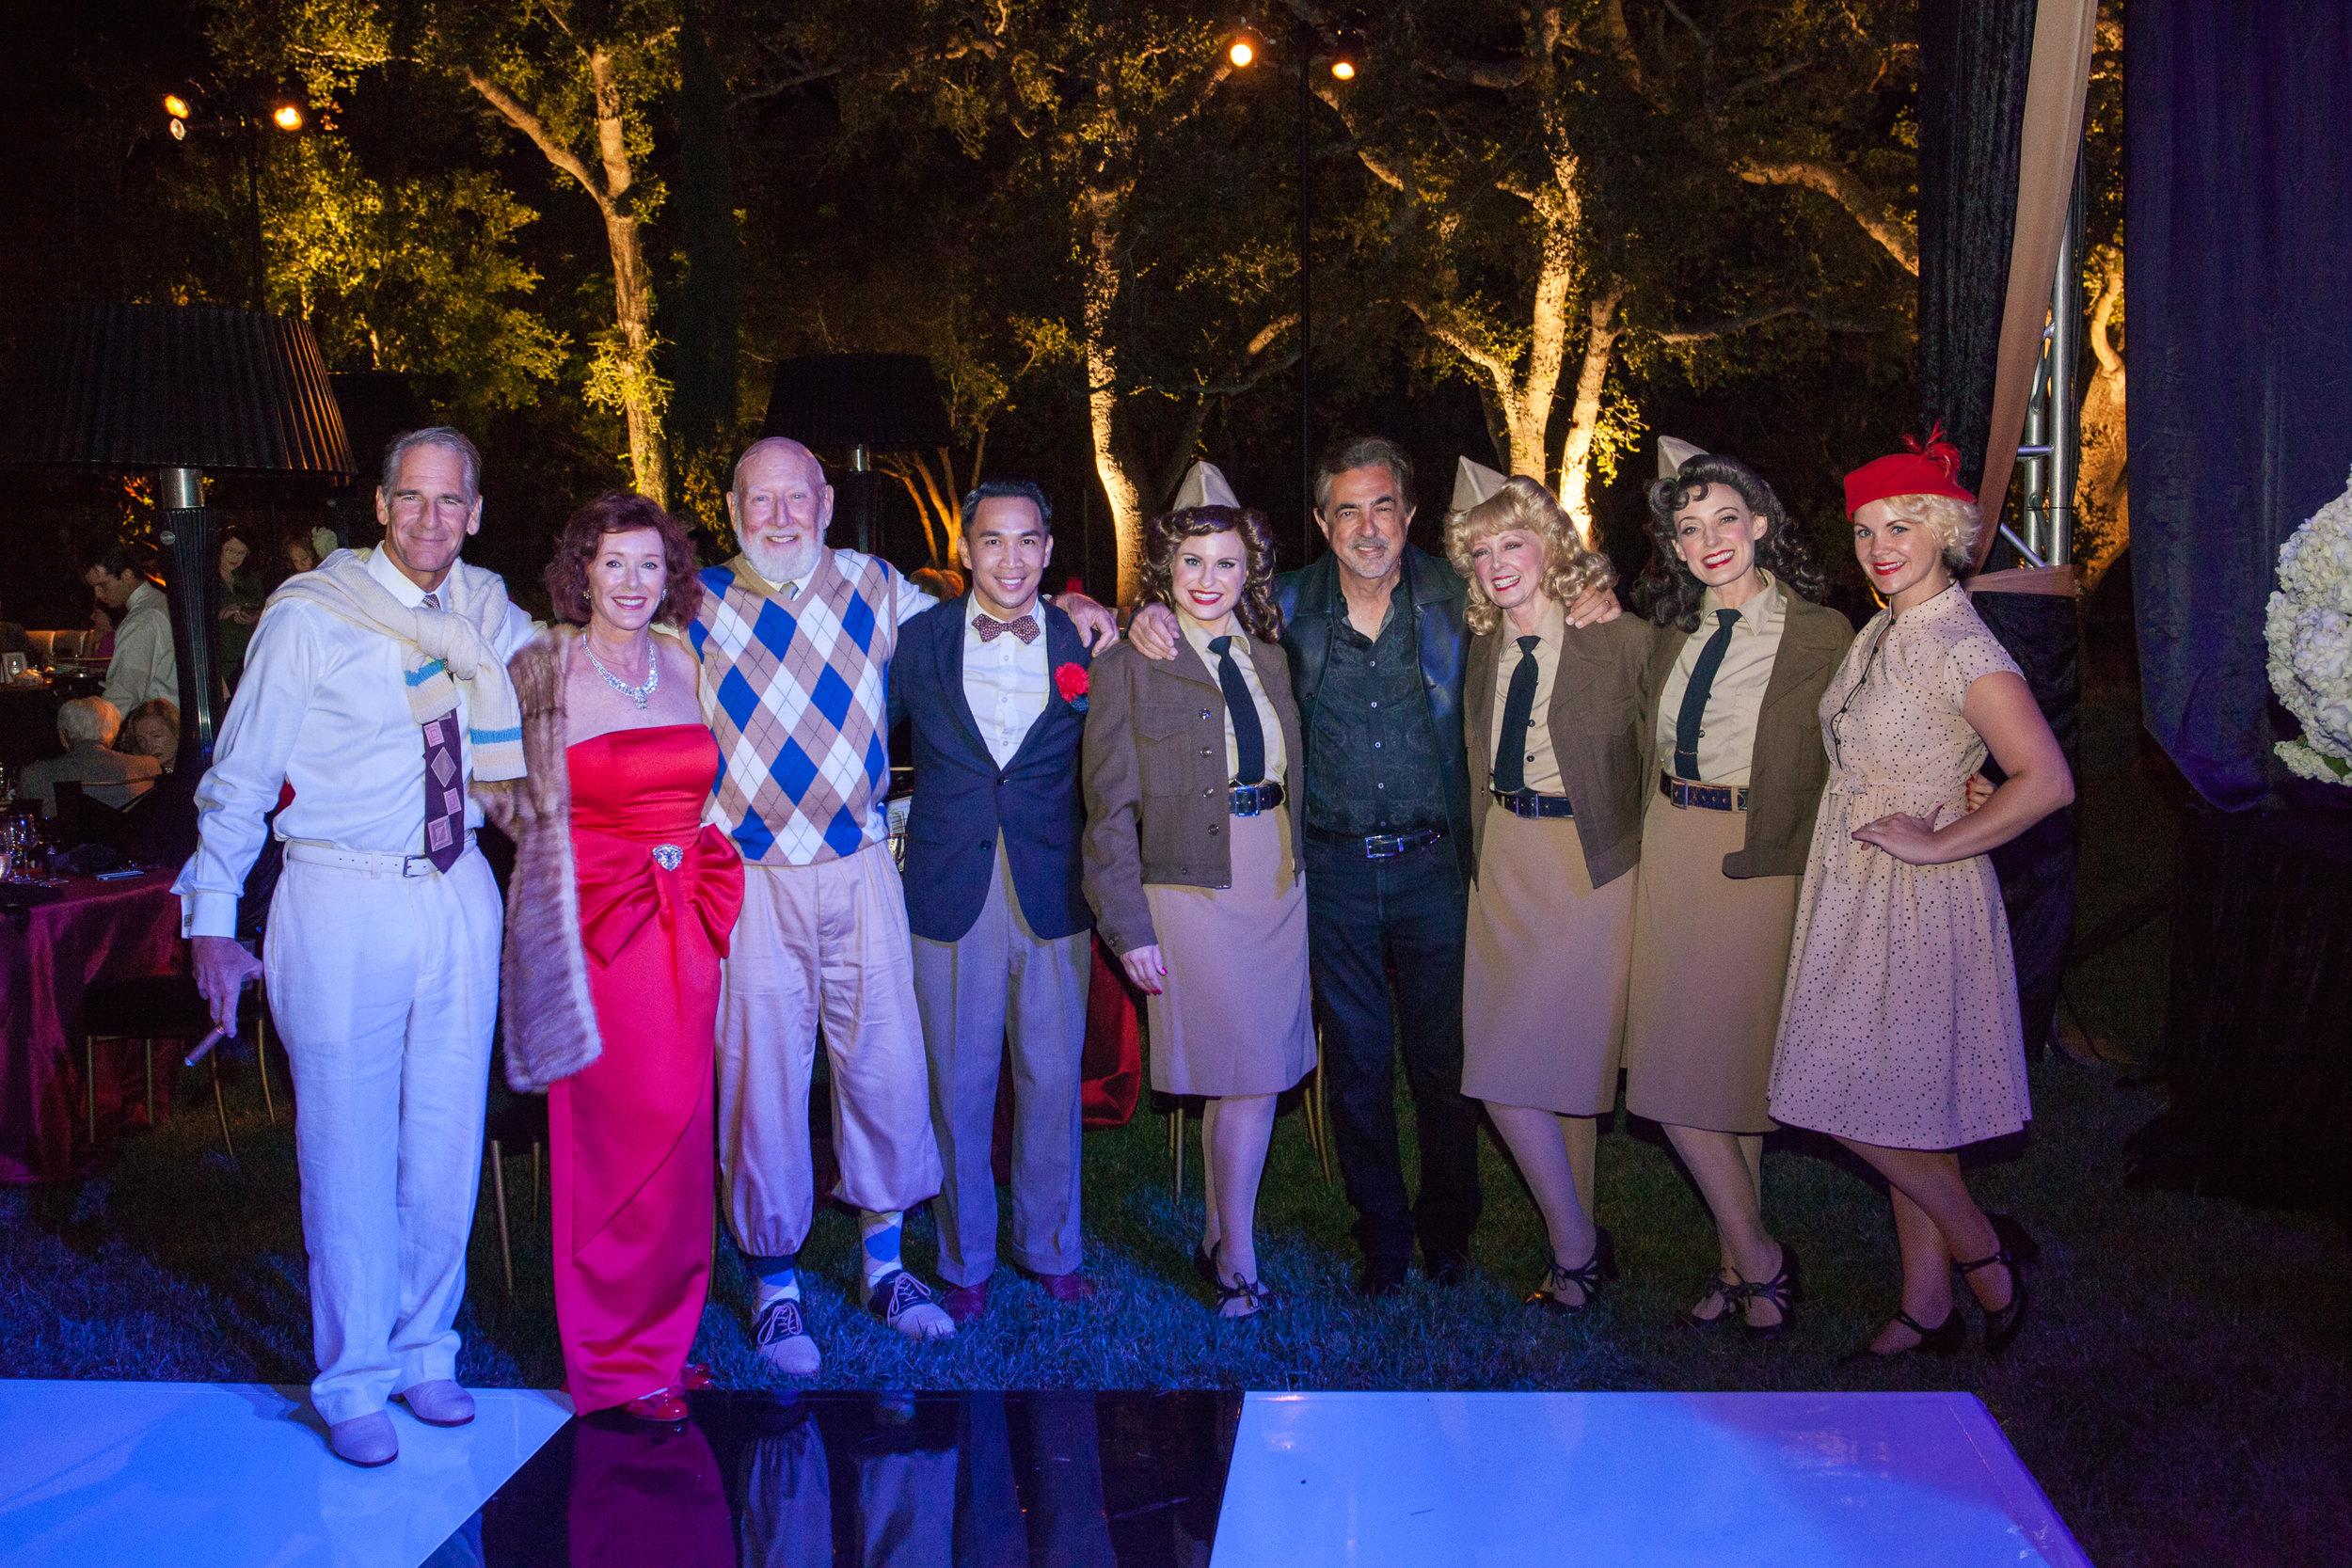 With Scott Bakula, Vivienne and Don Bellisario, Joe Mantegna, and dancers.